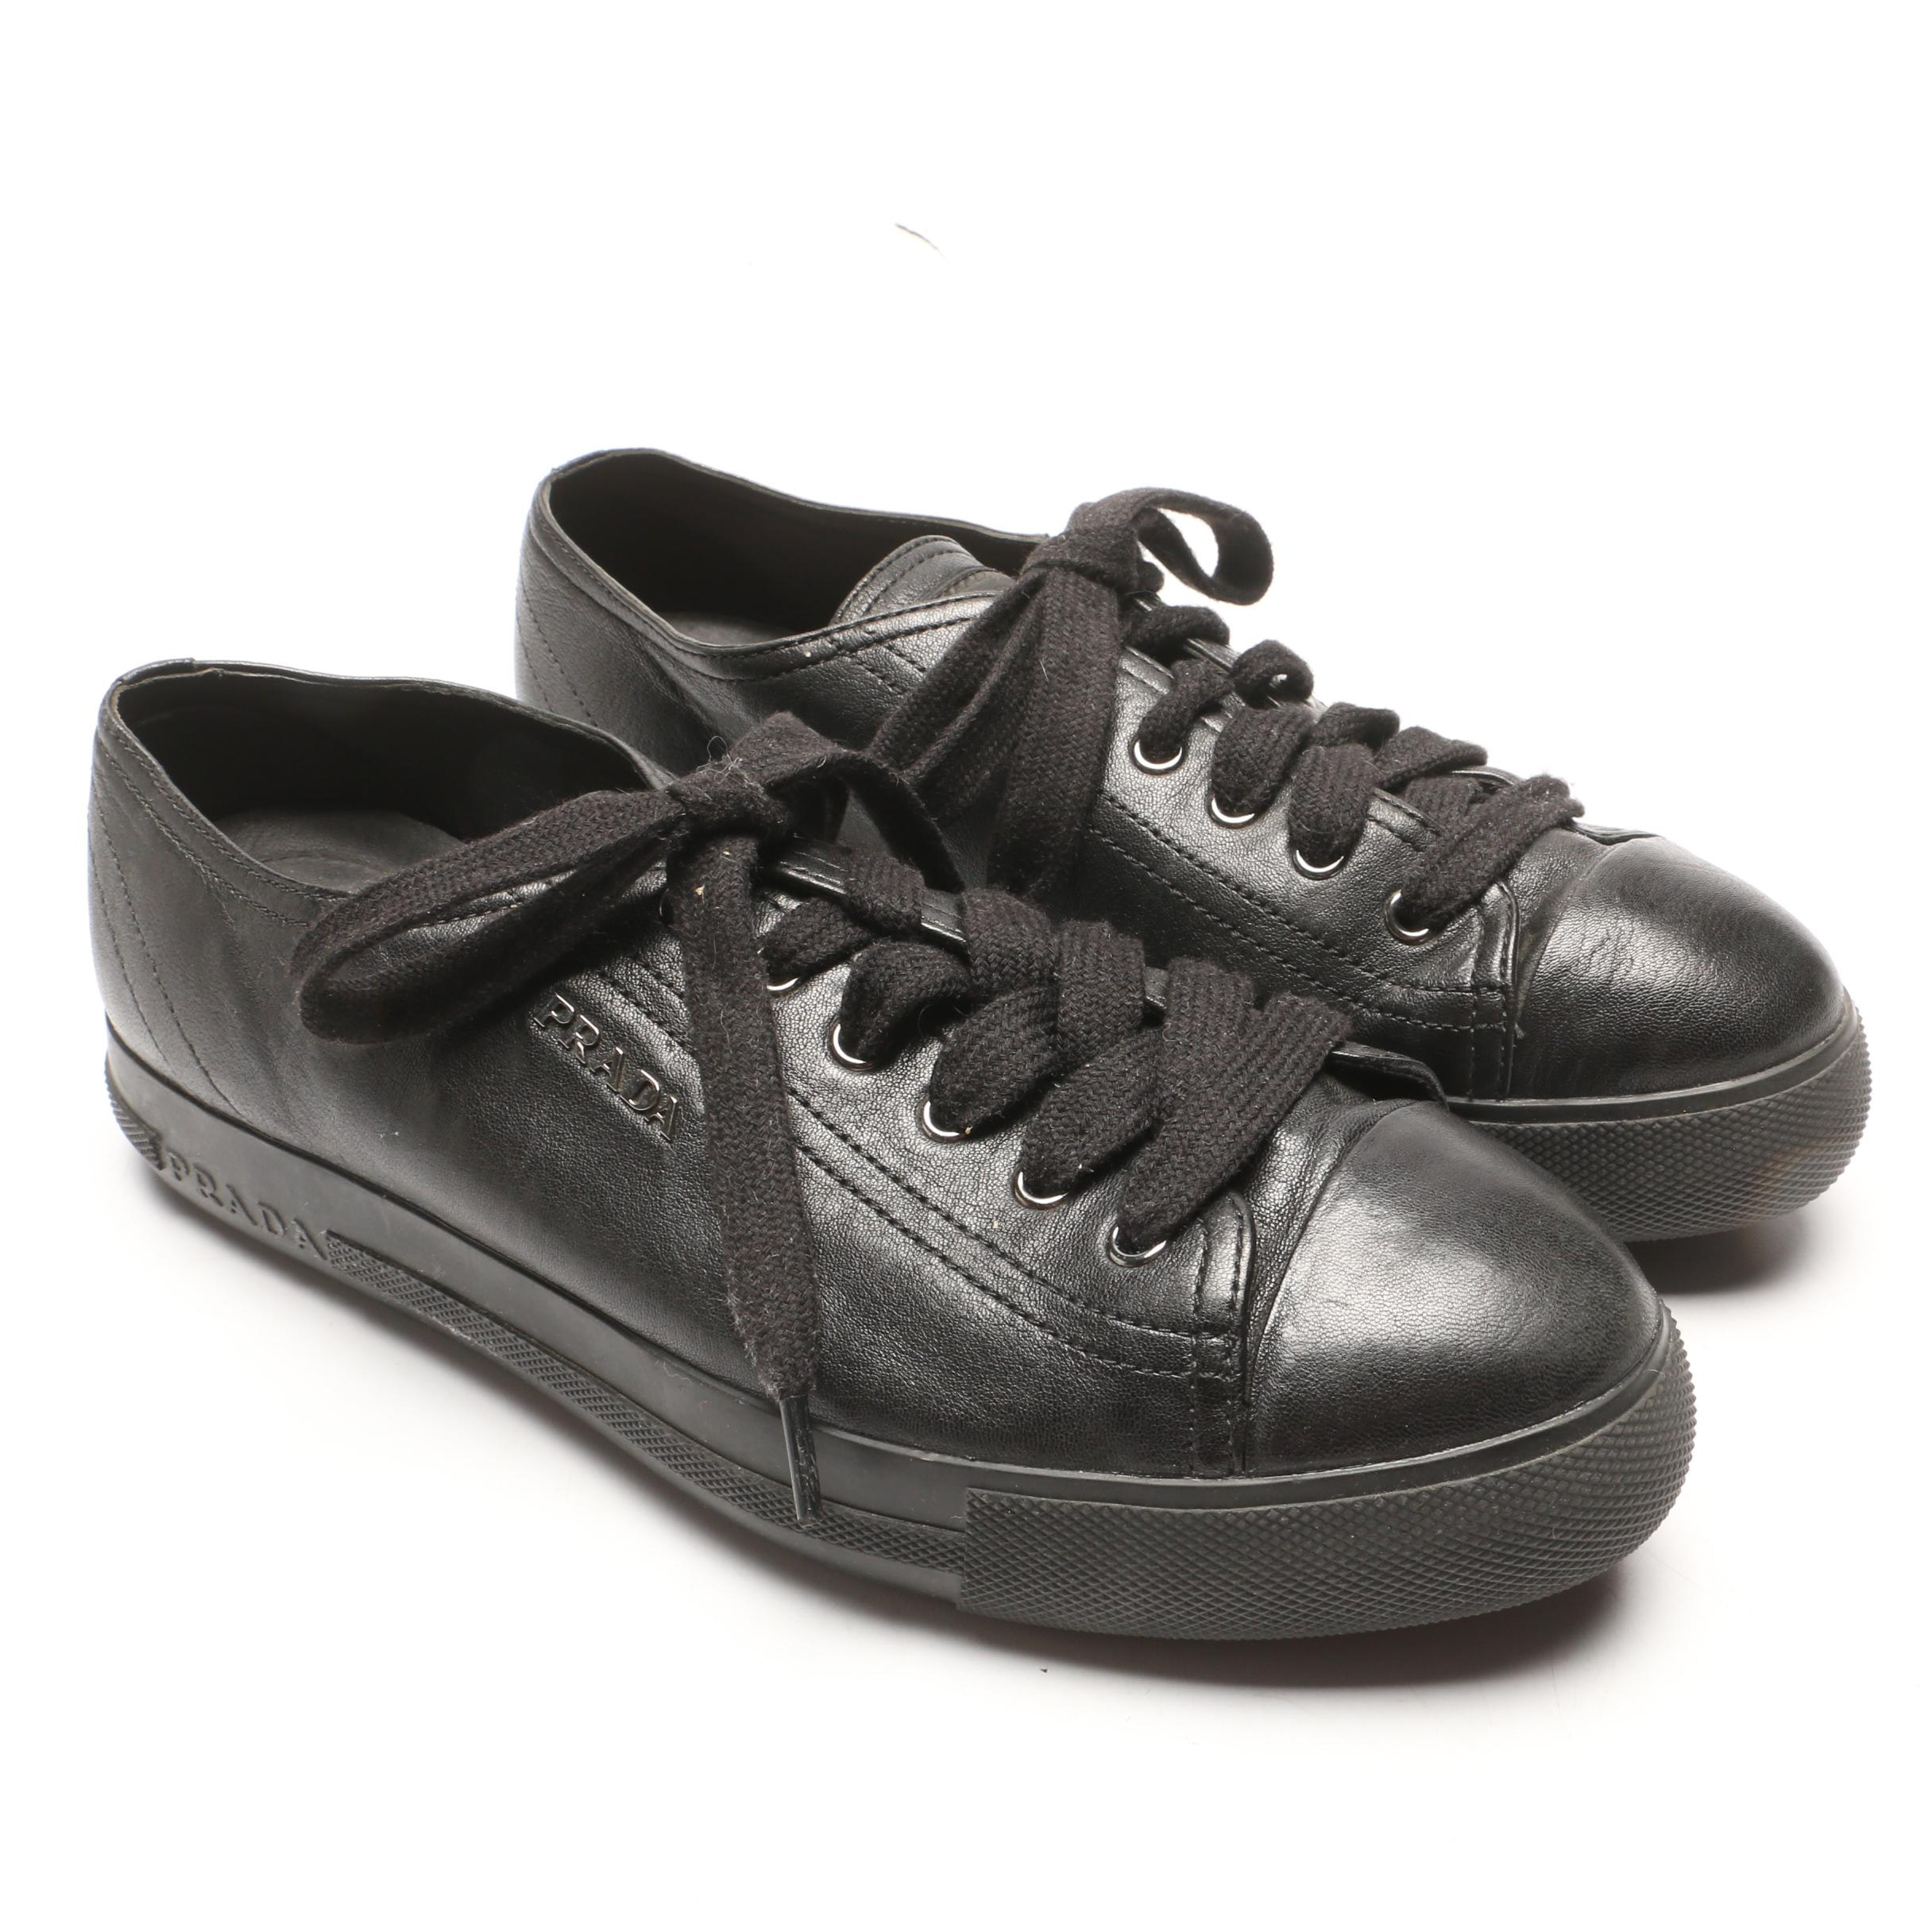 Prada Black Leather Platform Sneakers